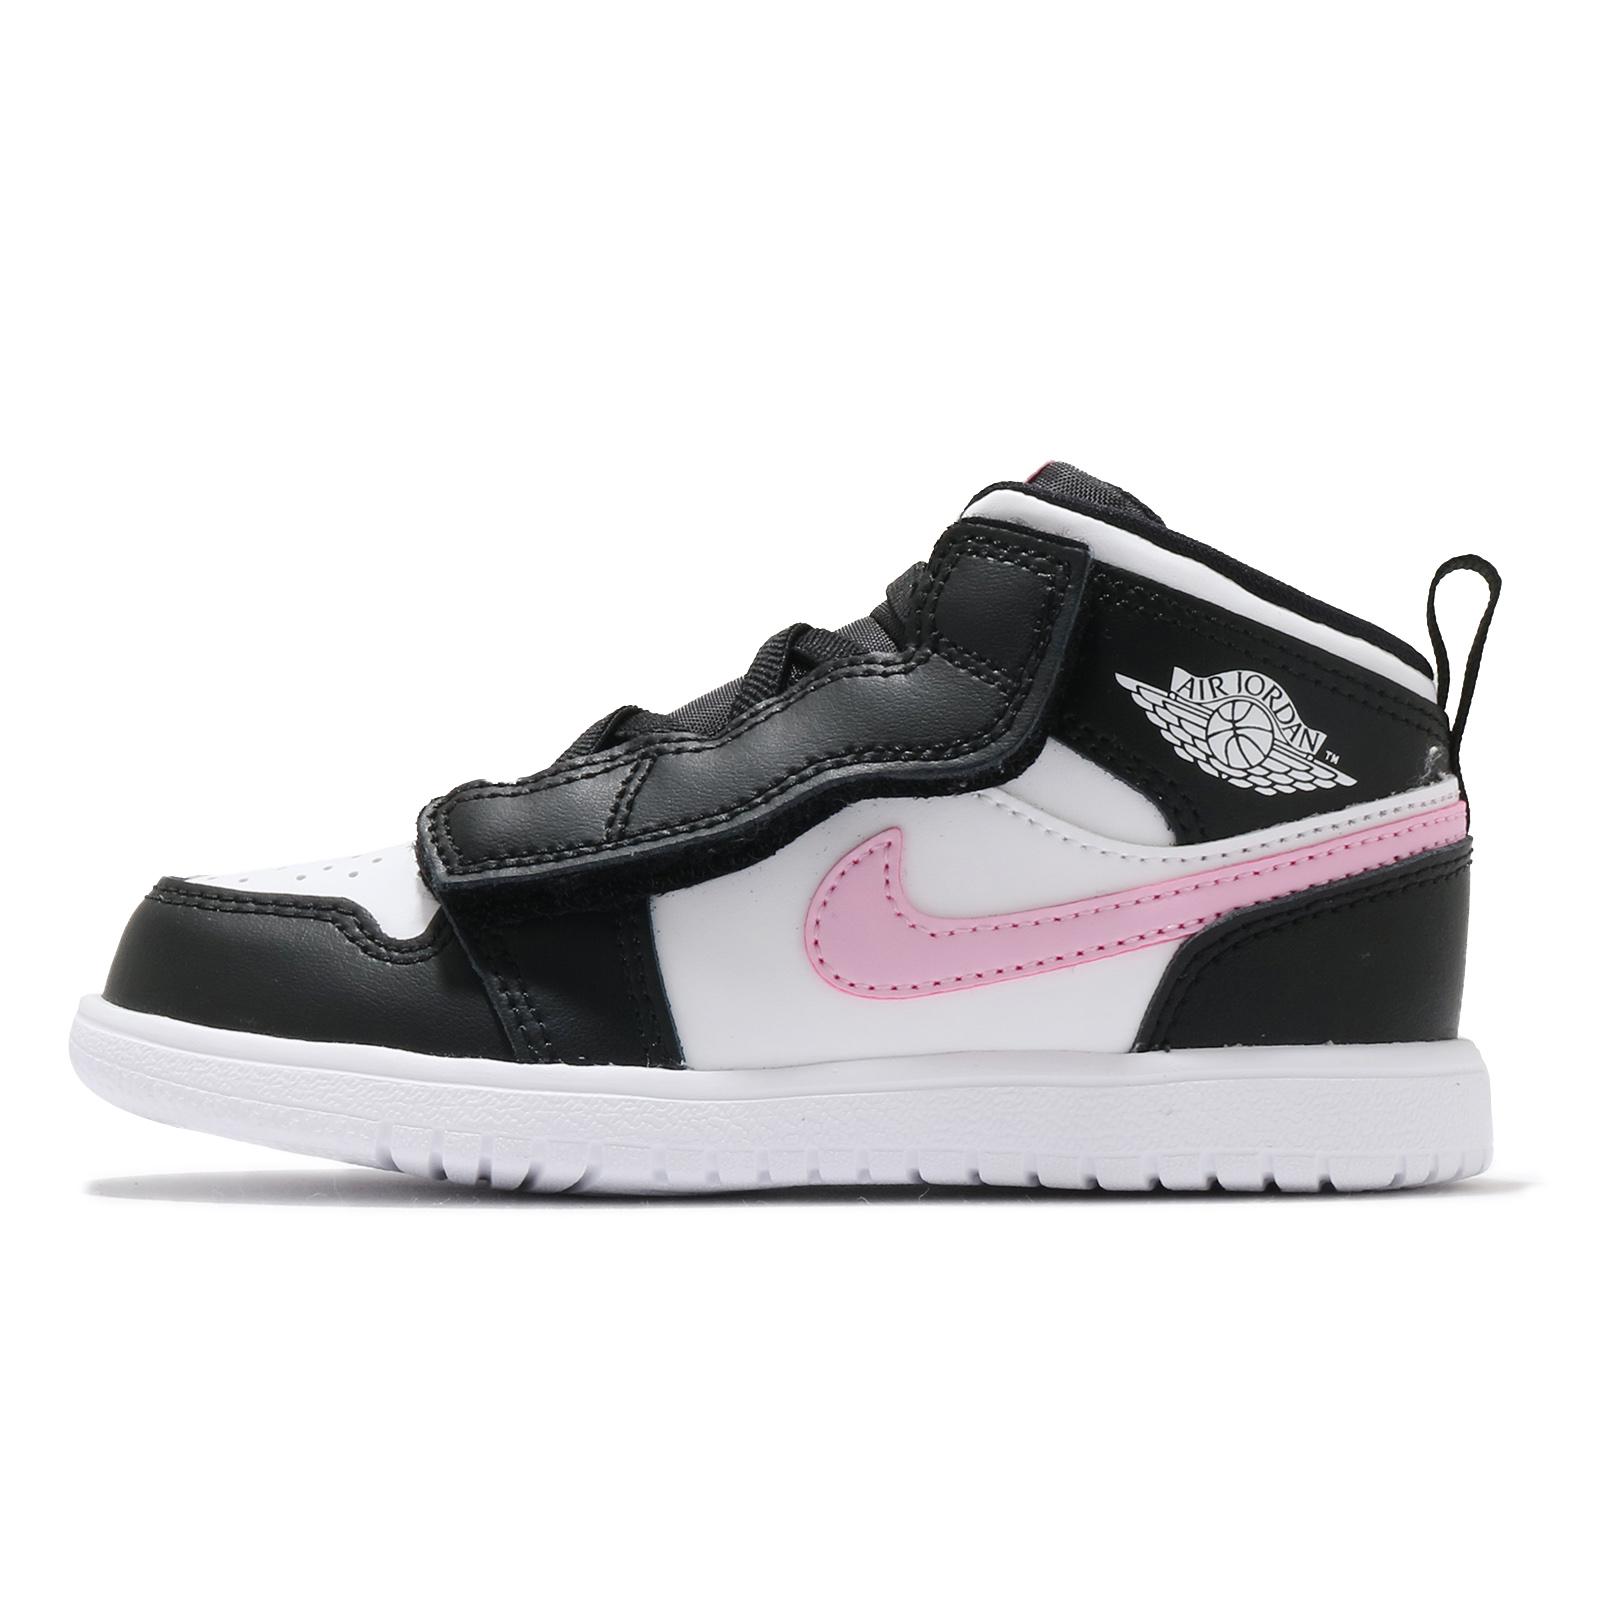 Nike 童鞋 Jordan 1 Mid ALT TD 黑 白 粉紅 魔鬼氈 幼童 喬丹【ACS】 AT4613-103